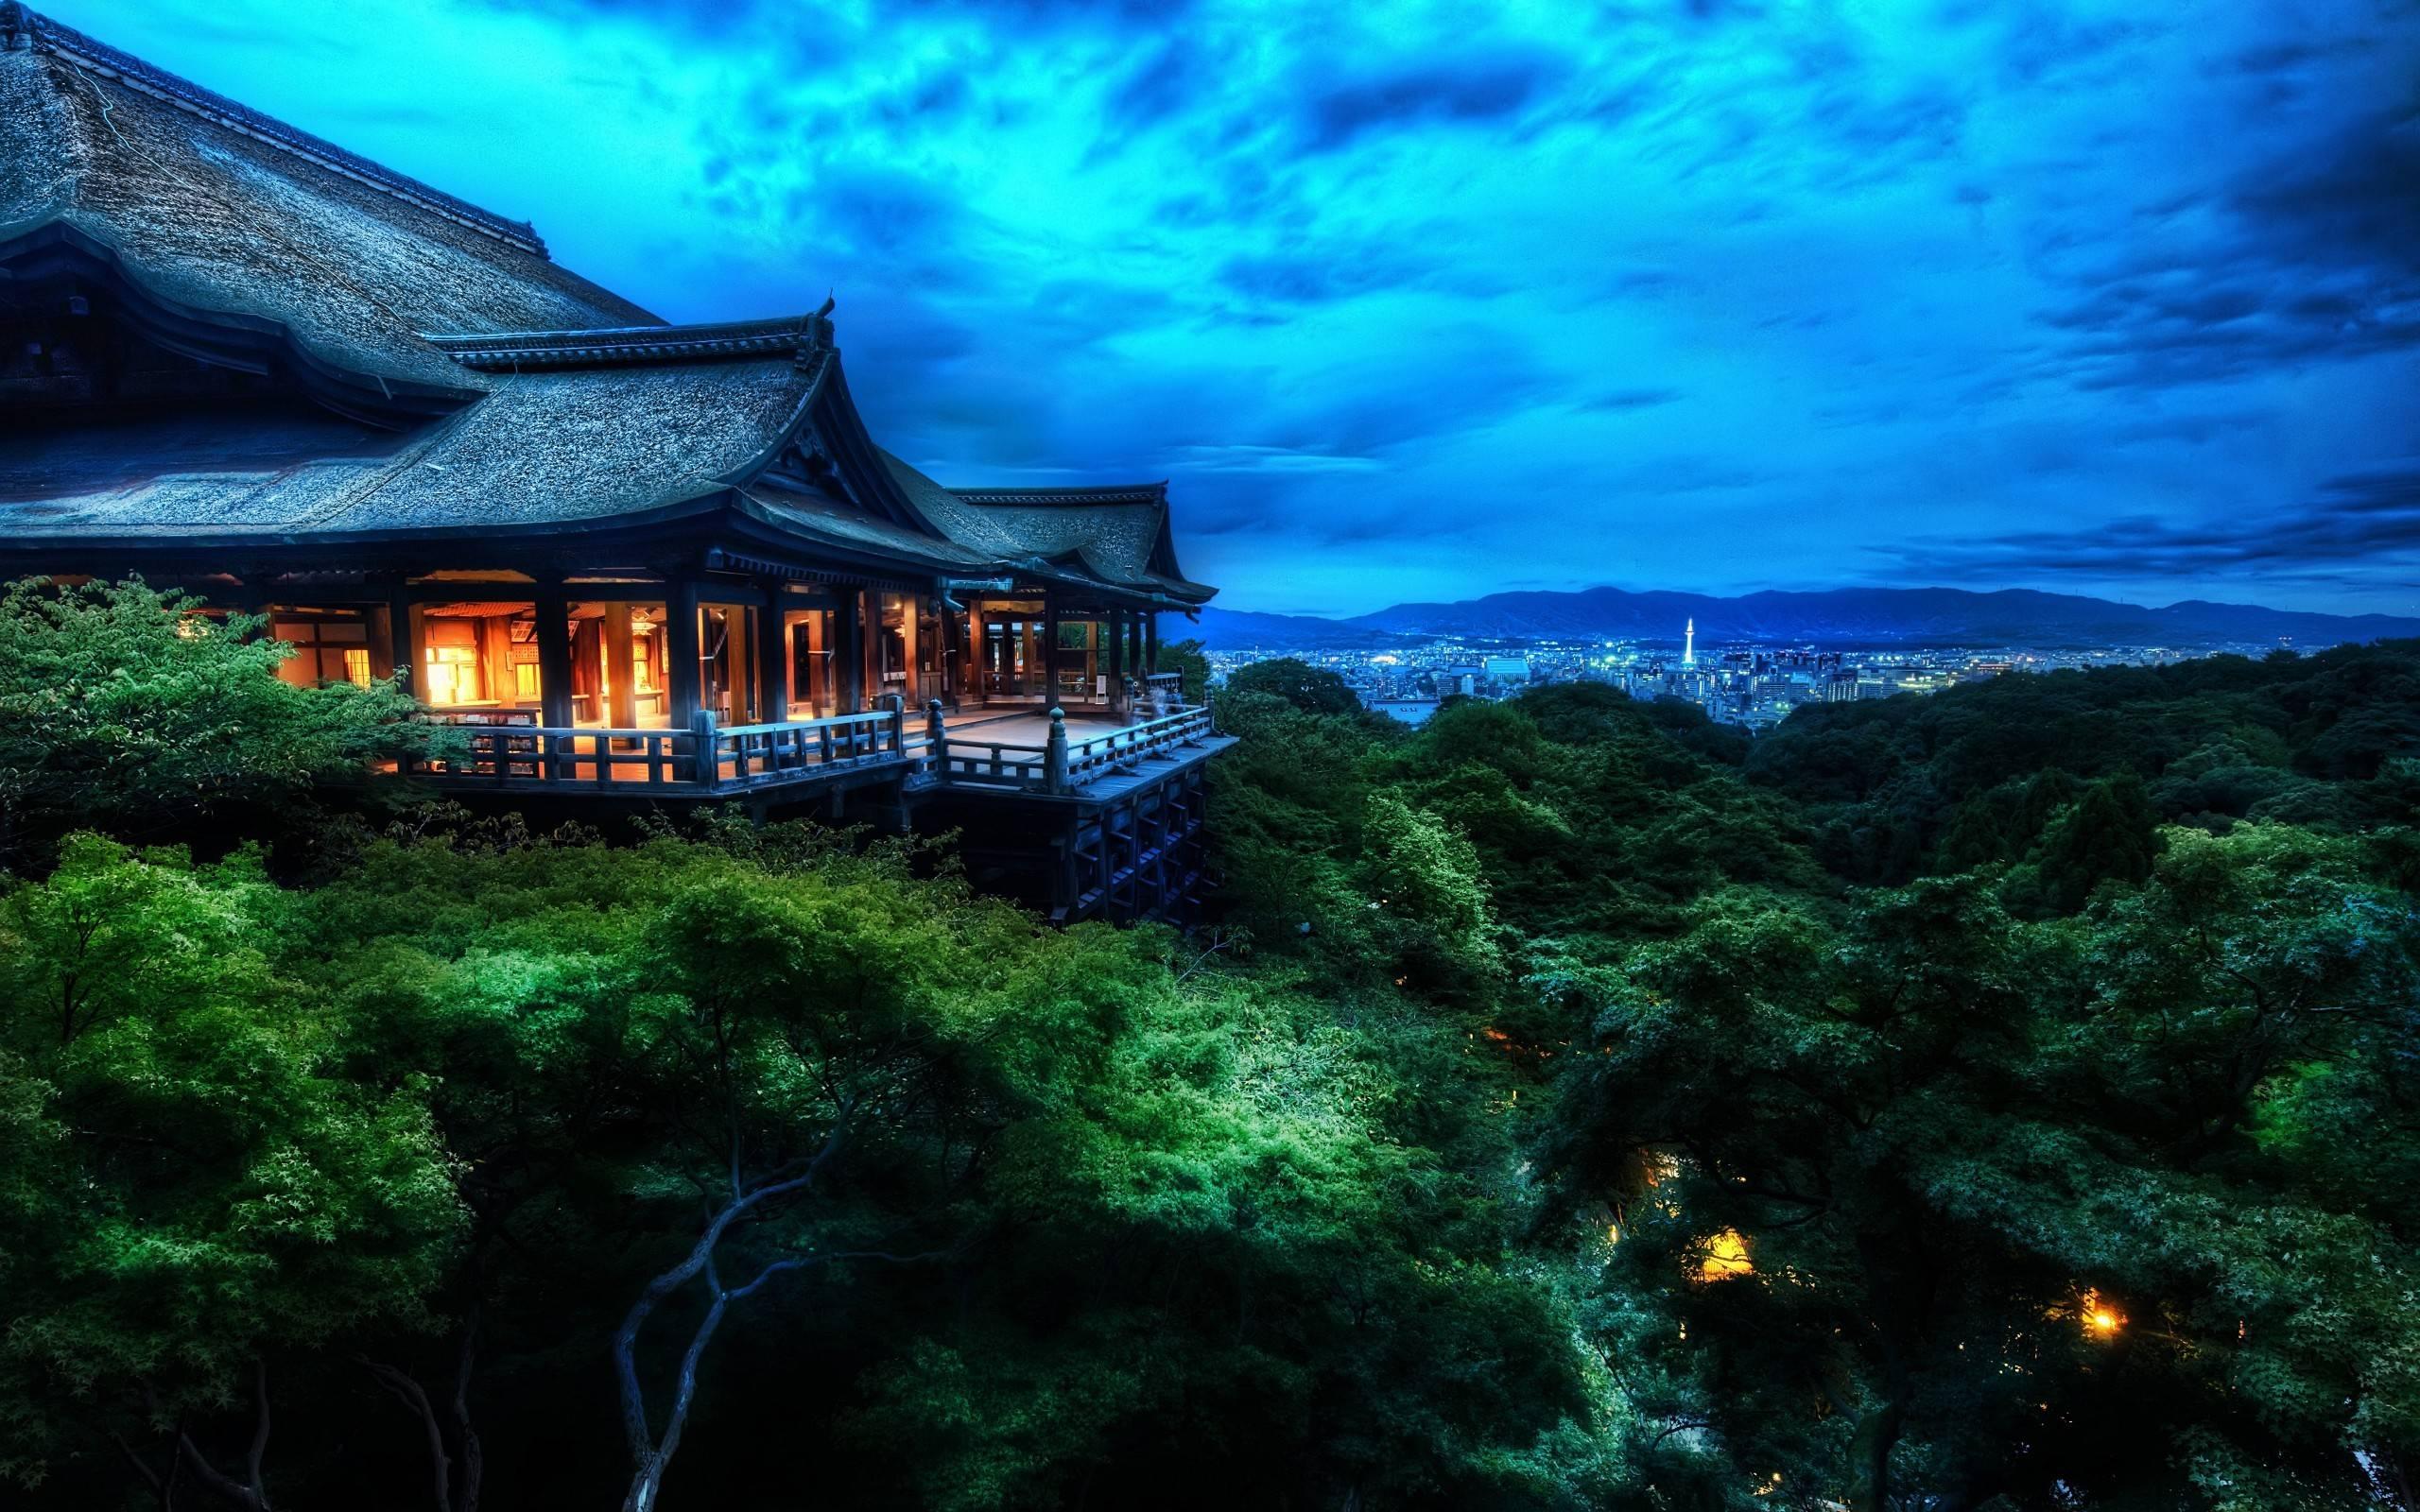 Japan Wallpapers HD 2560x1600